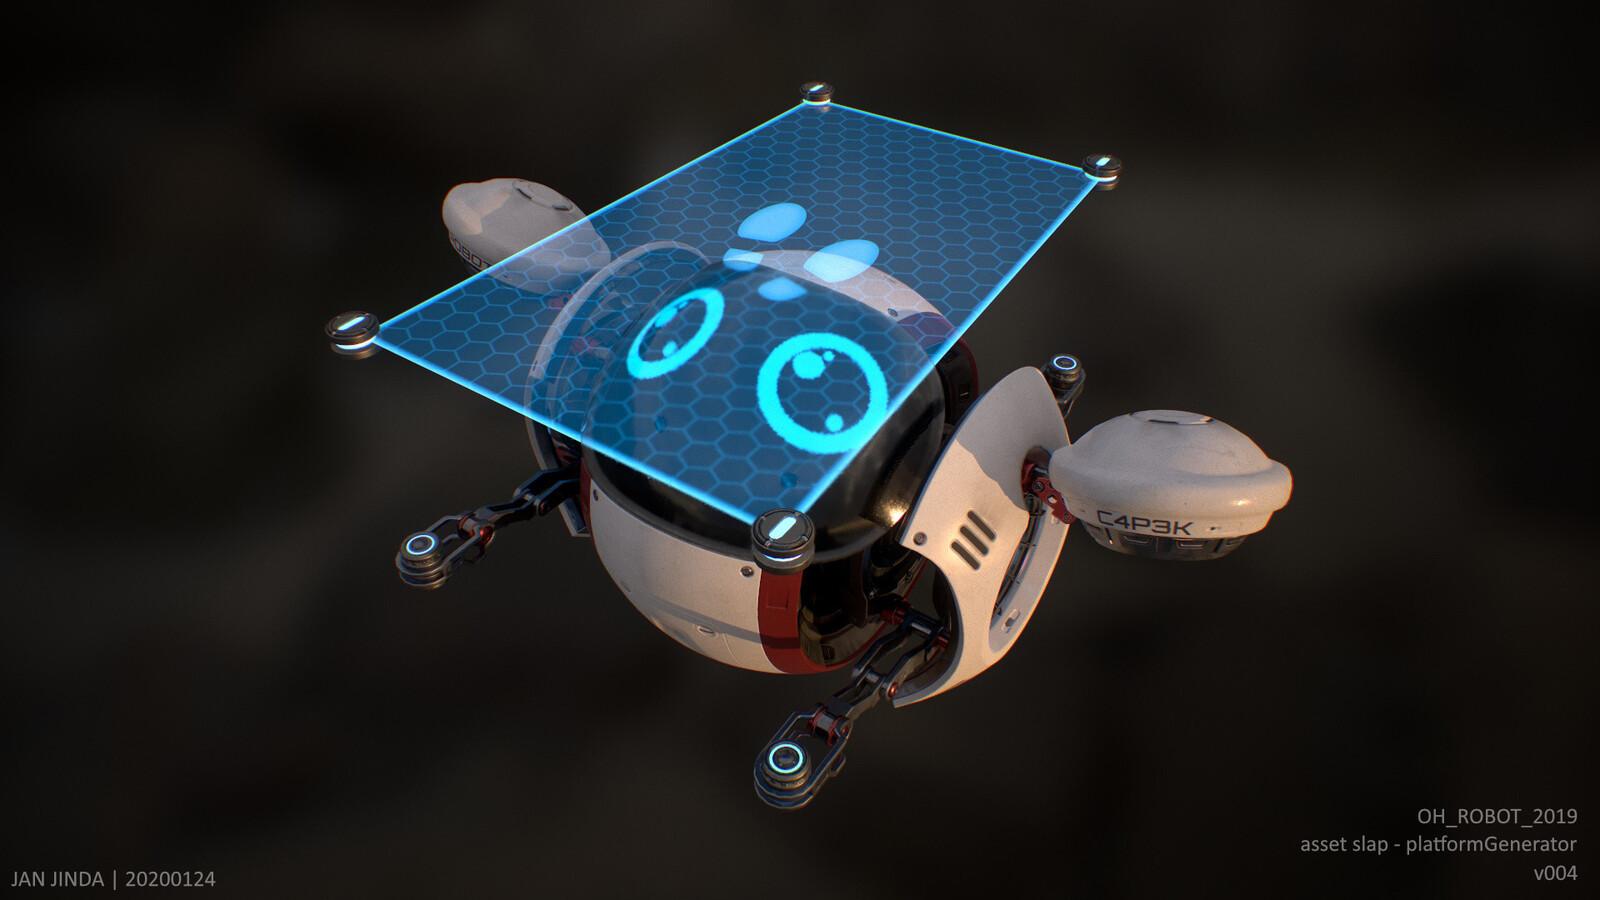 Pose - platform generator